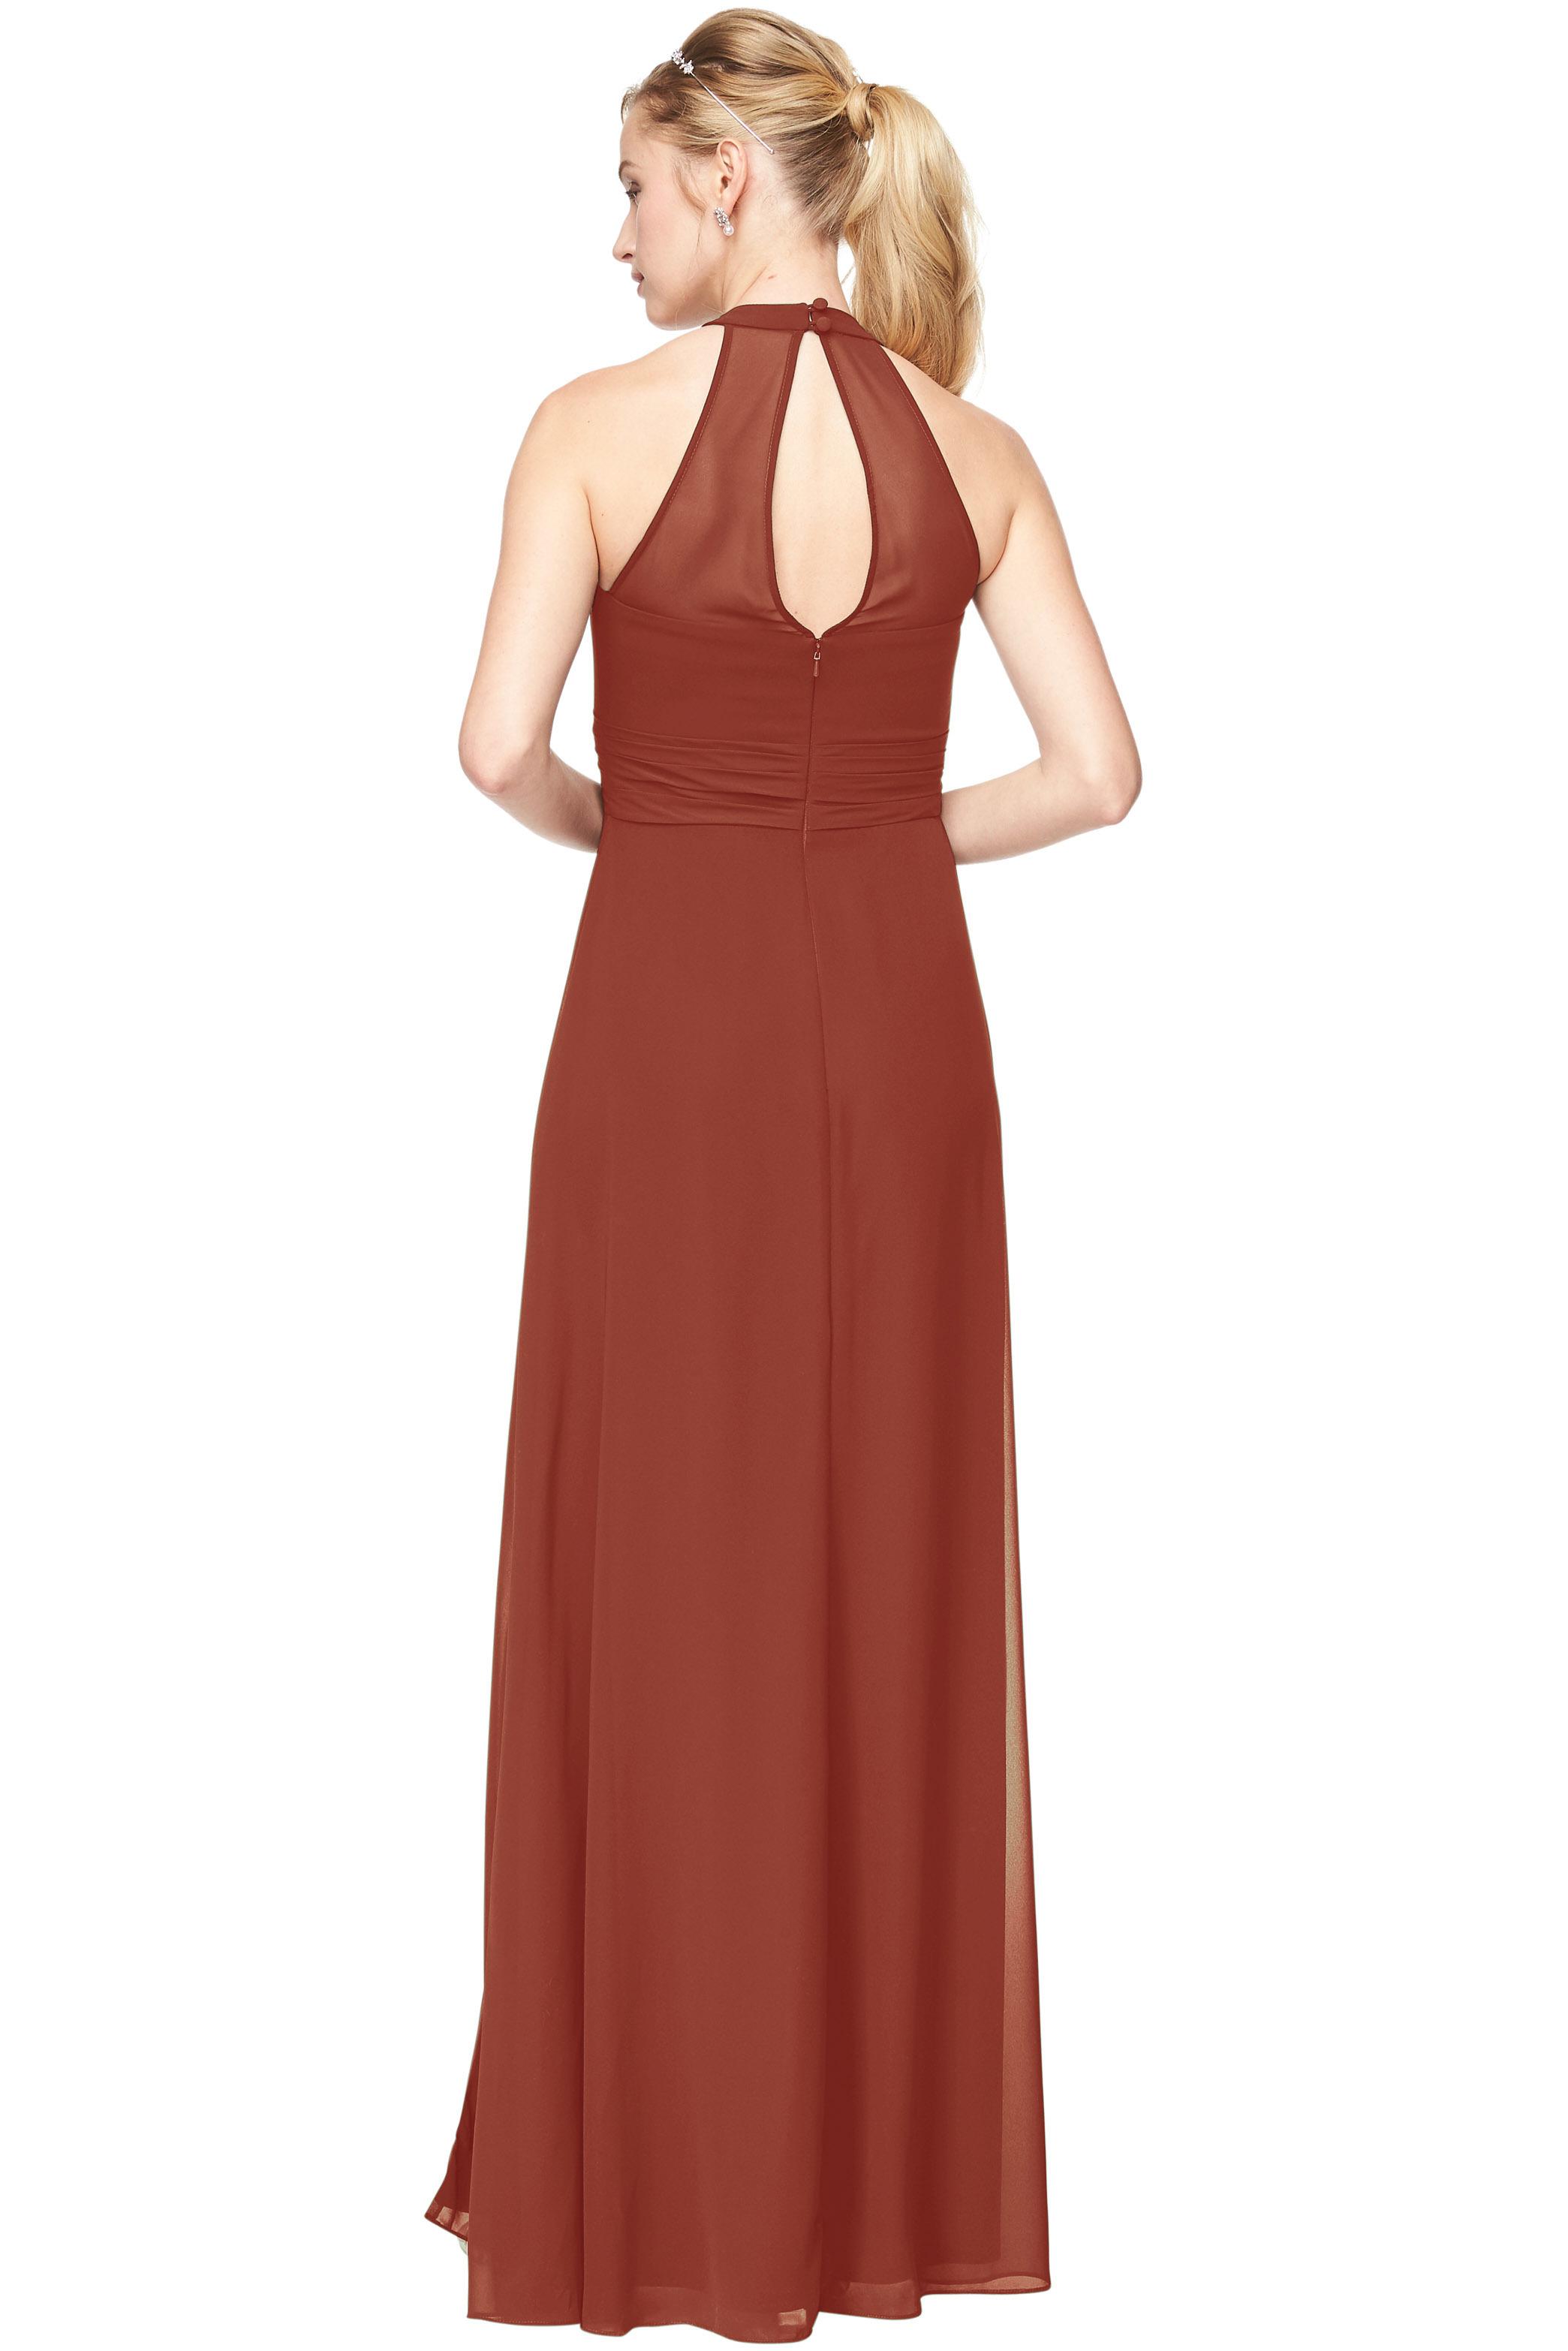 Bill Levkoff RUST Chiffon V-Neck A-Line gown, $198.00 Back